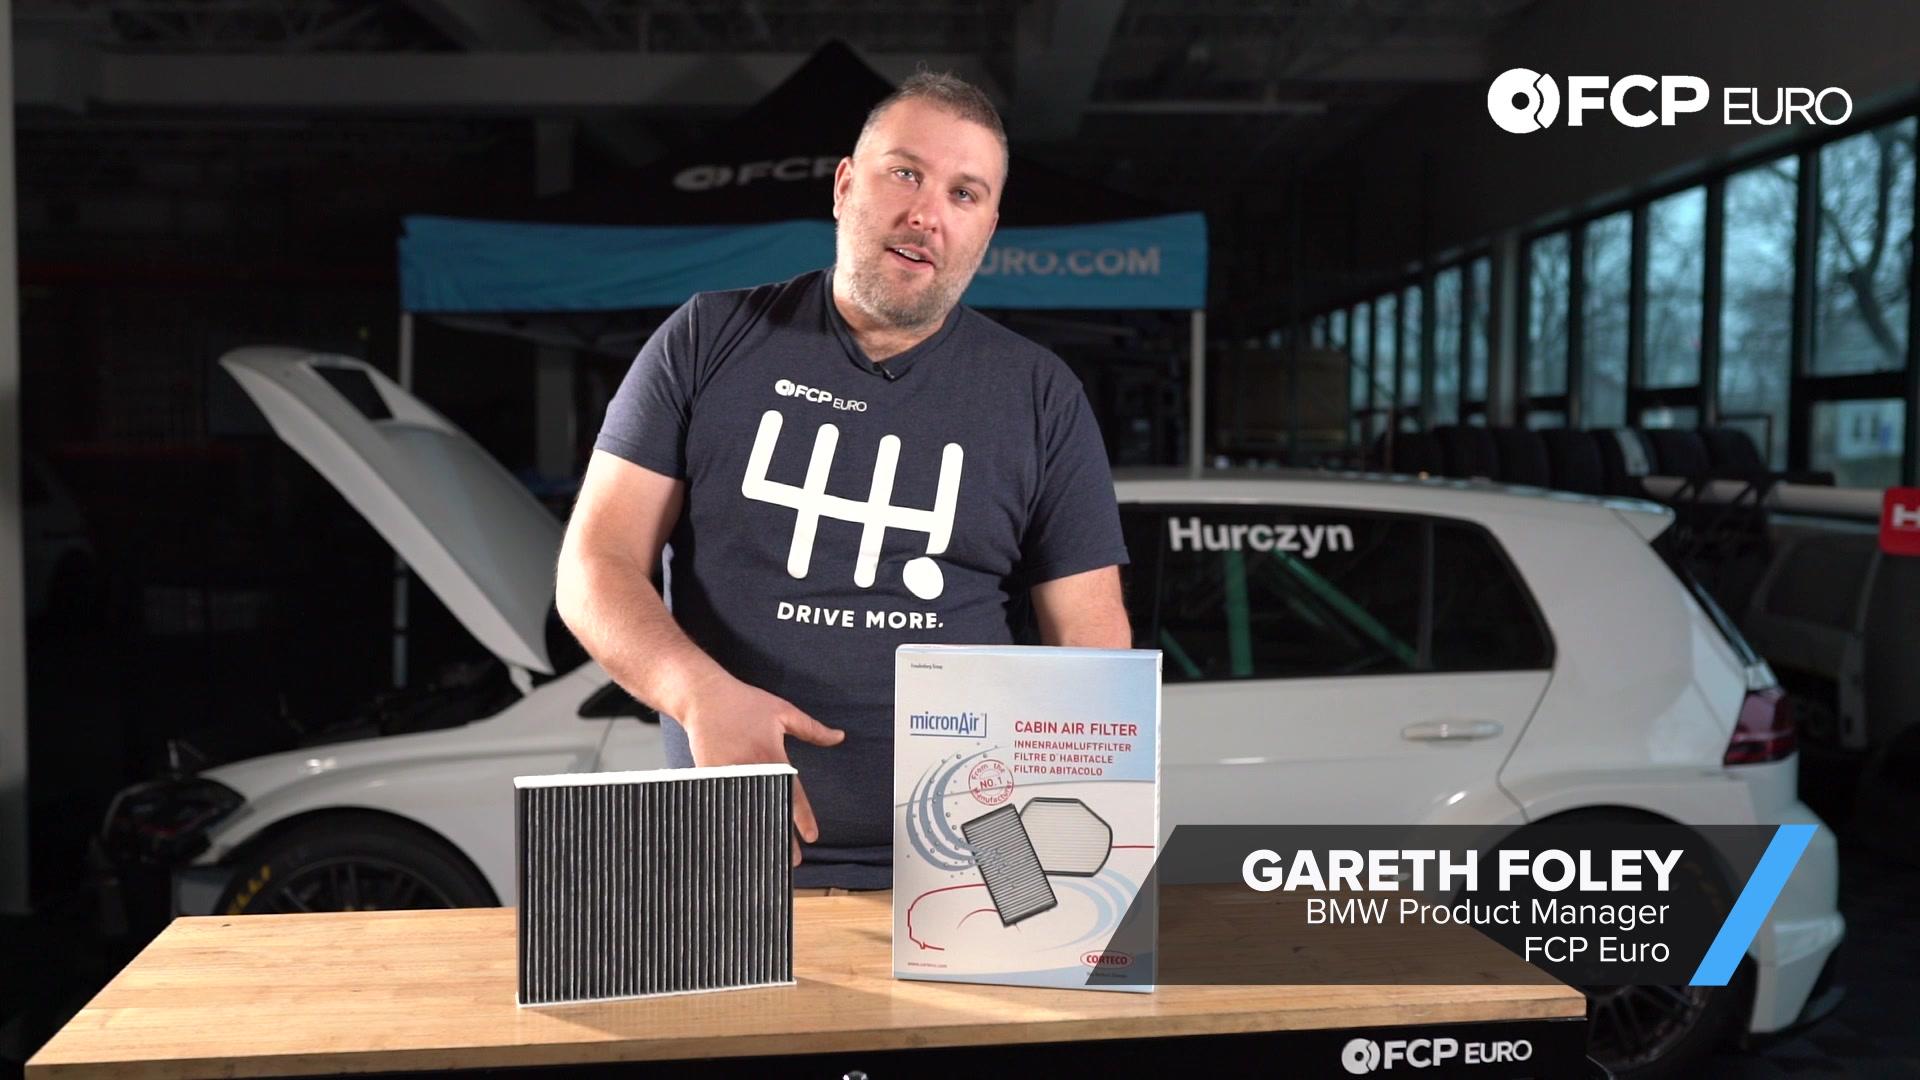 BMW Cabin Air Filter Gareth